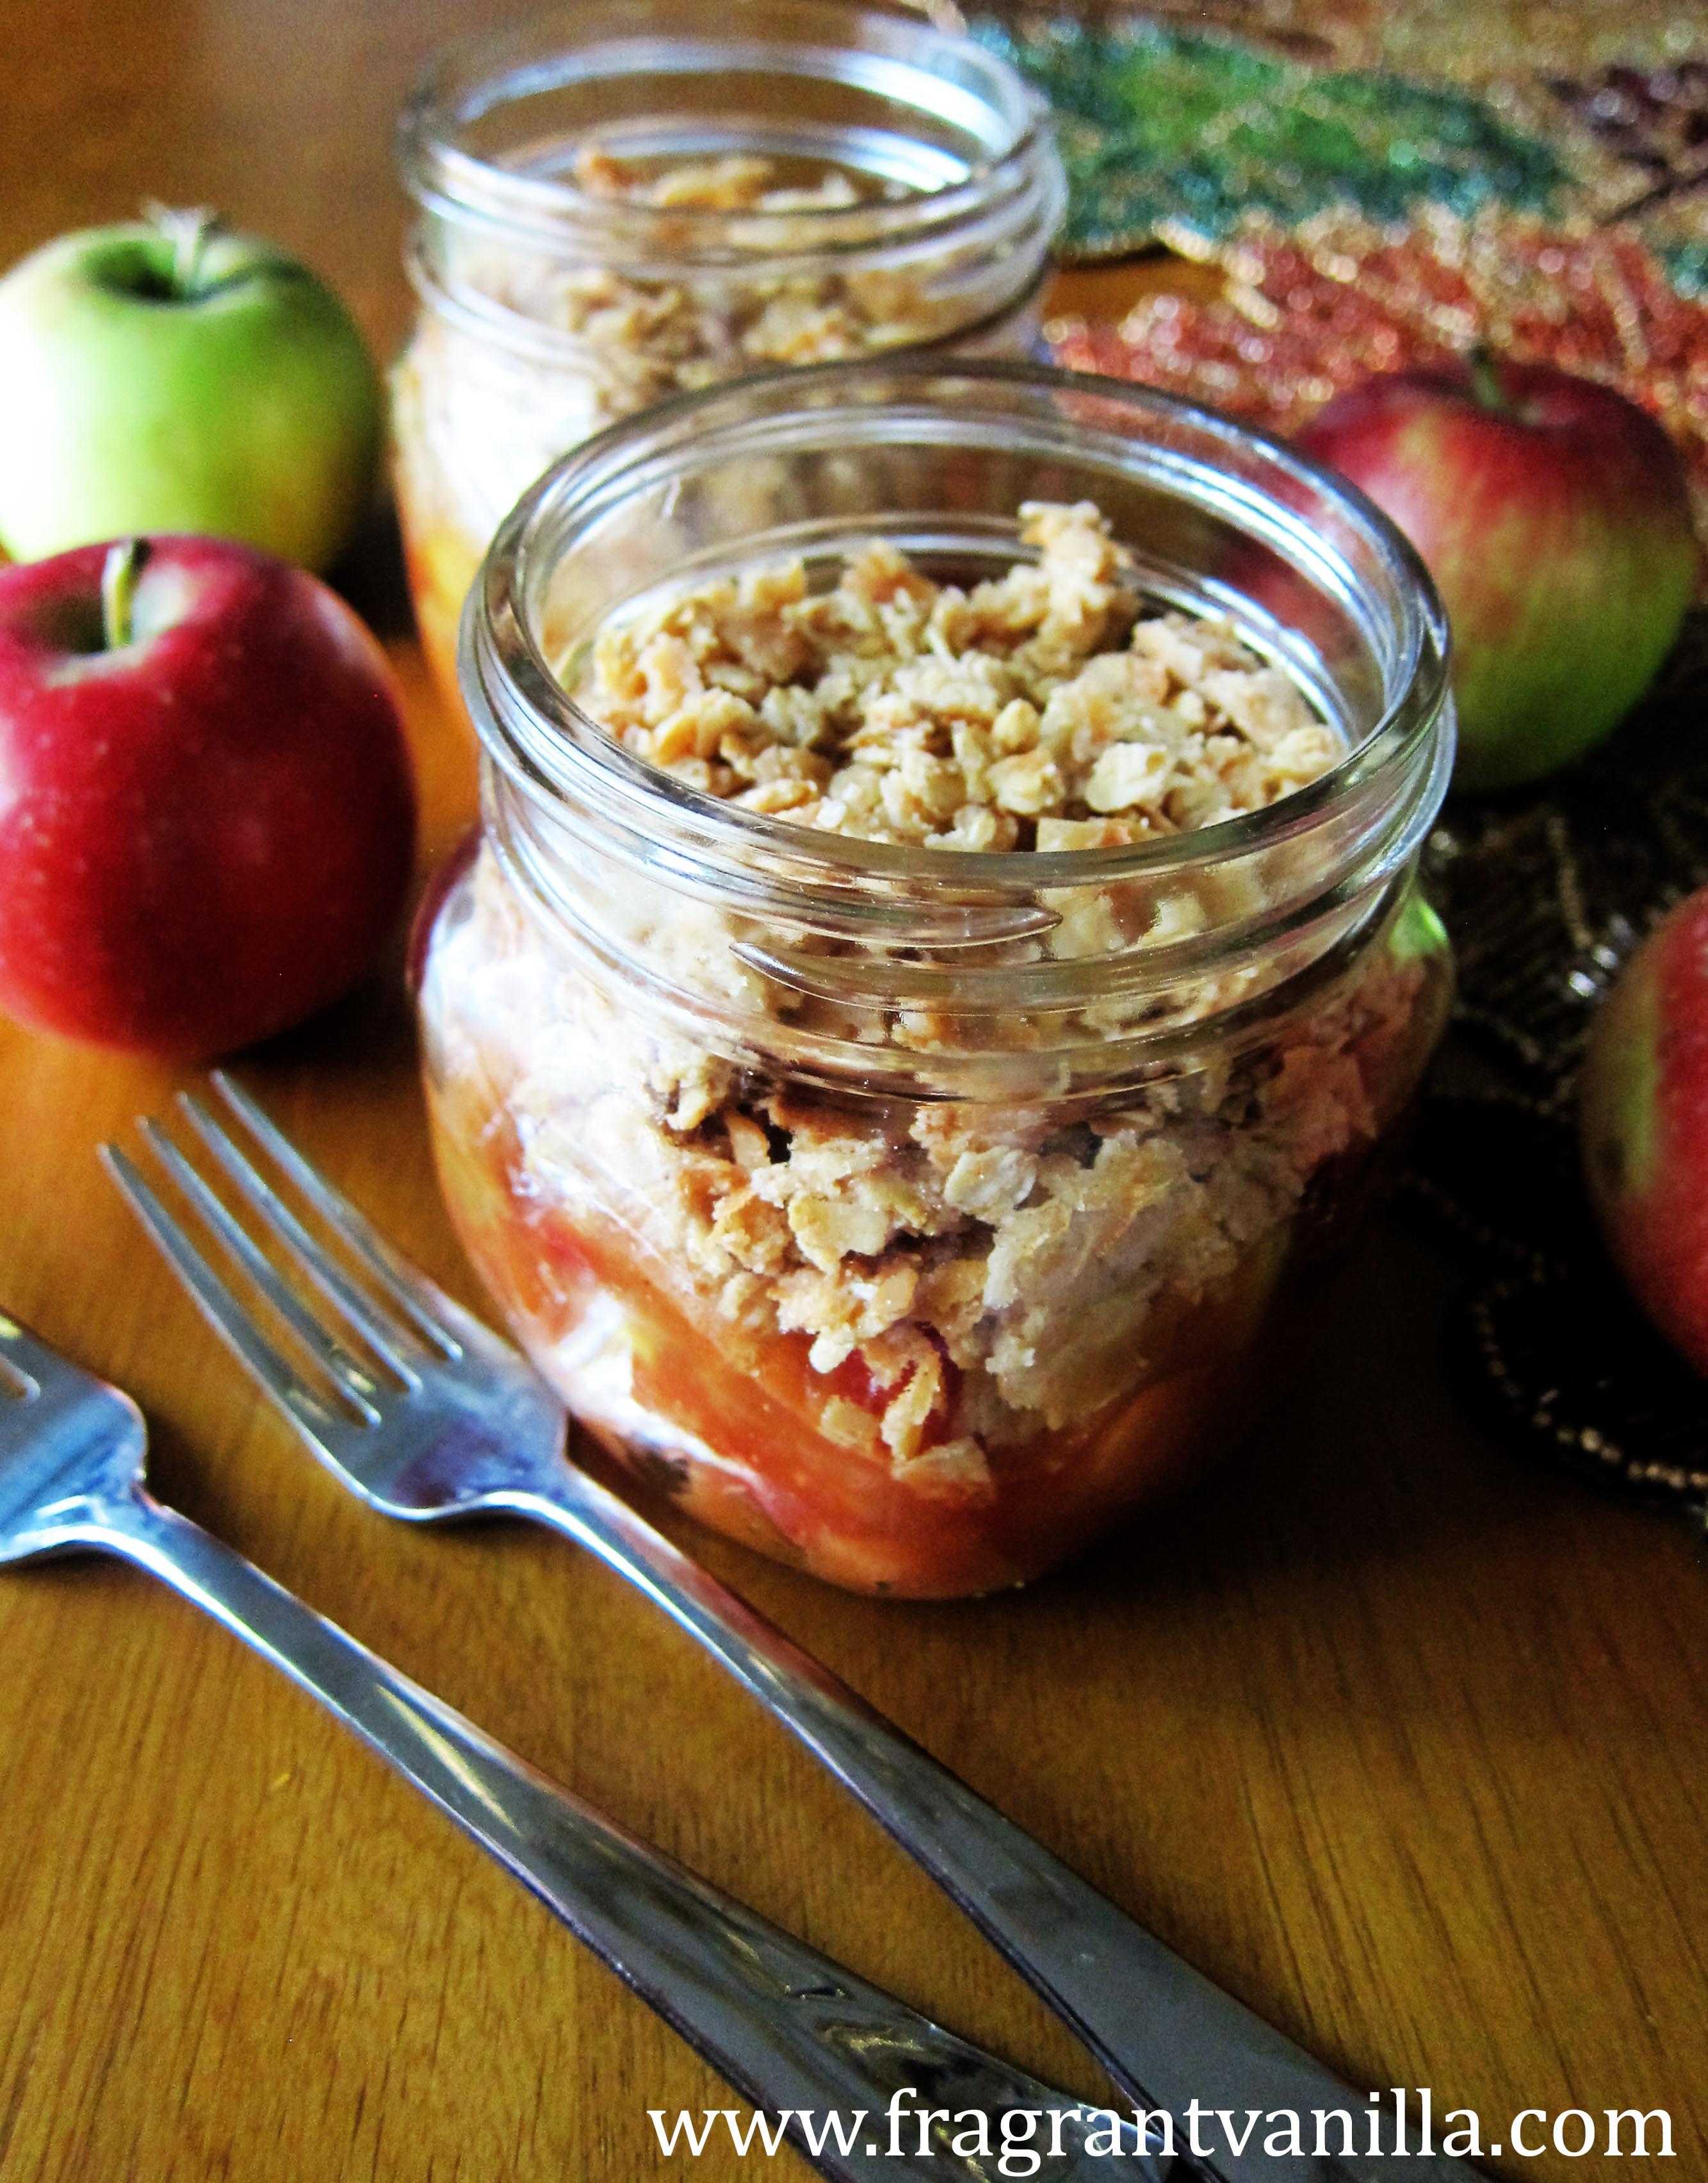 Vegan Spiced Apple Crisp in a Jar